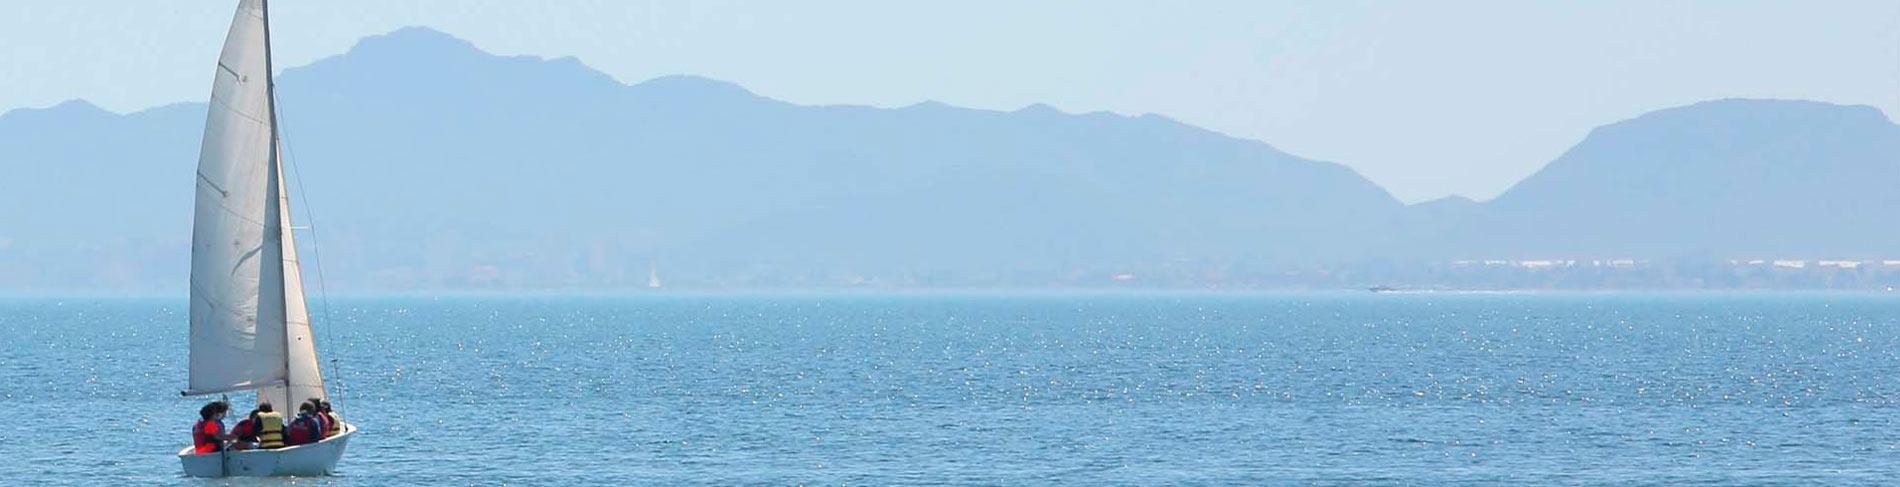 Mar Menor serie panoramica deportes nauticos